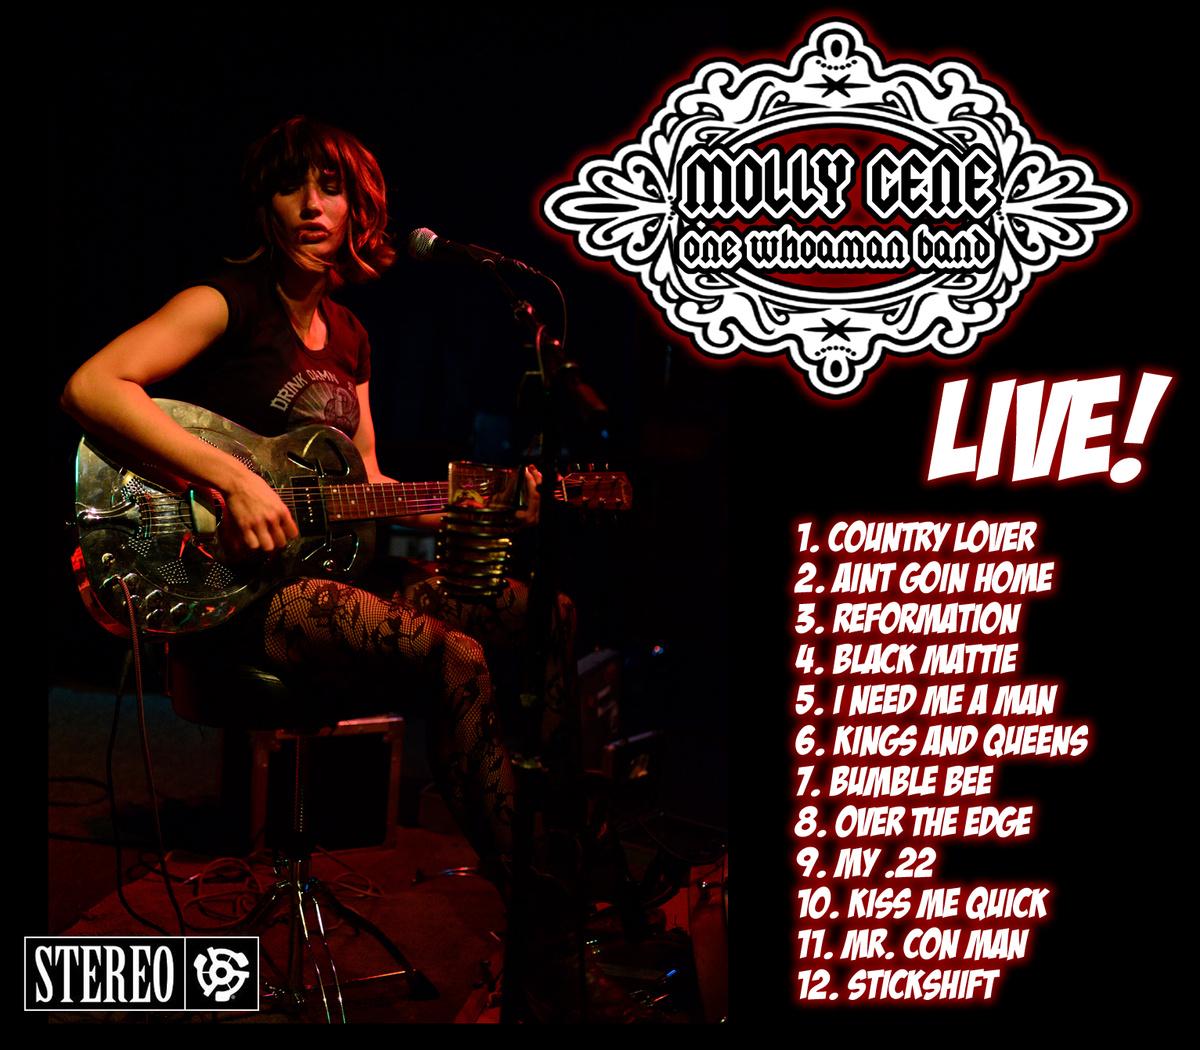 molly-gene-one-whoaman-band-live-nuevo-disco-en-directo